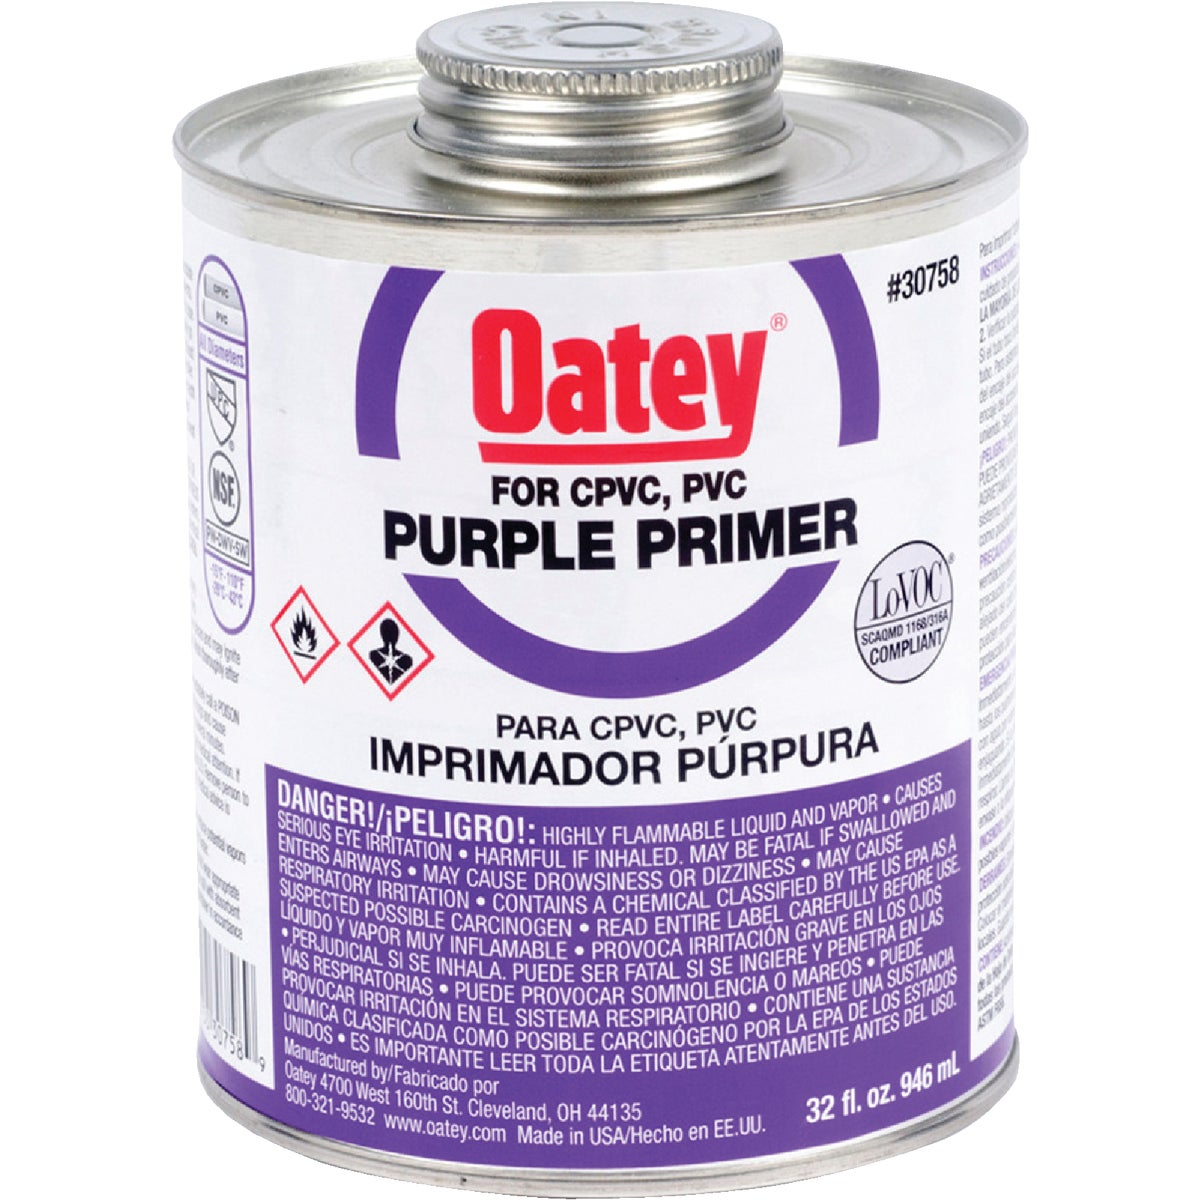 QUART PURPLE PRIMER - 30758 by Oatey Scs